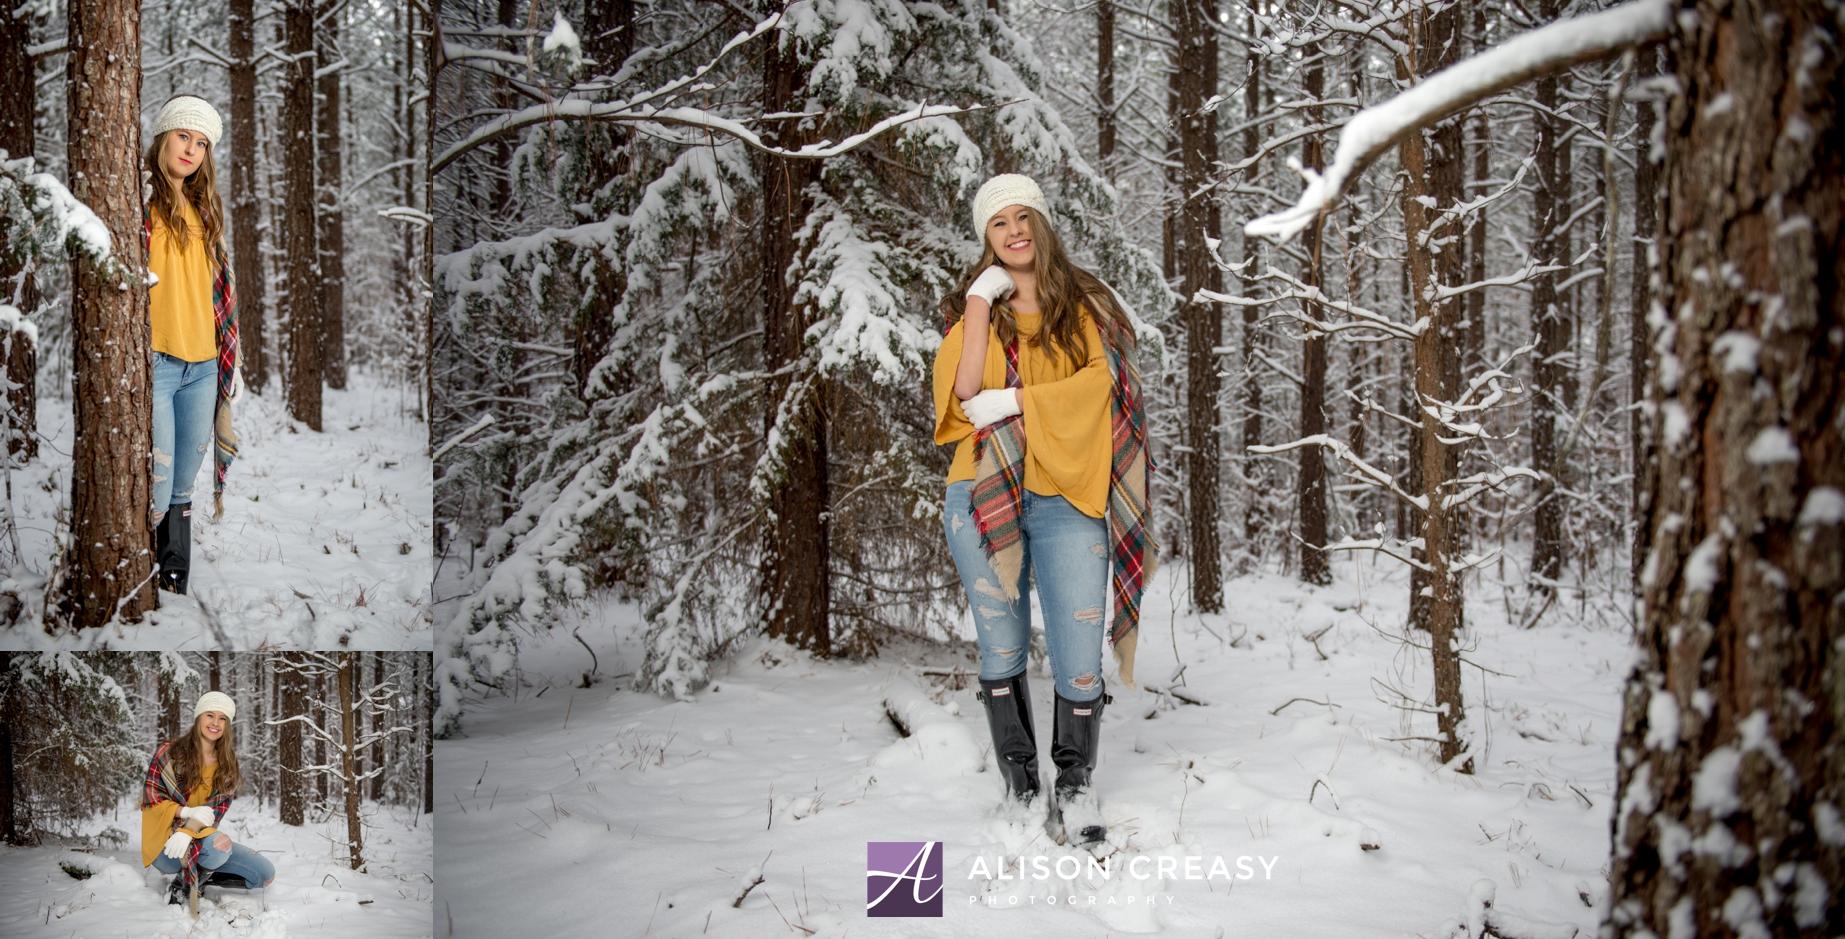 Alison-Creasy-Photography-Lynchburg-VA-Senior-Photographer_0021.jpg